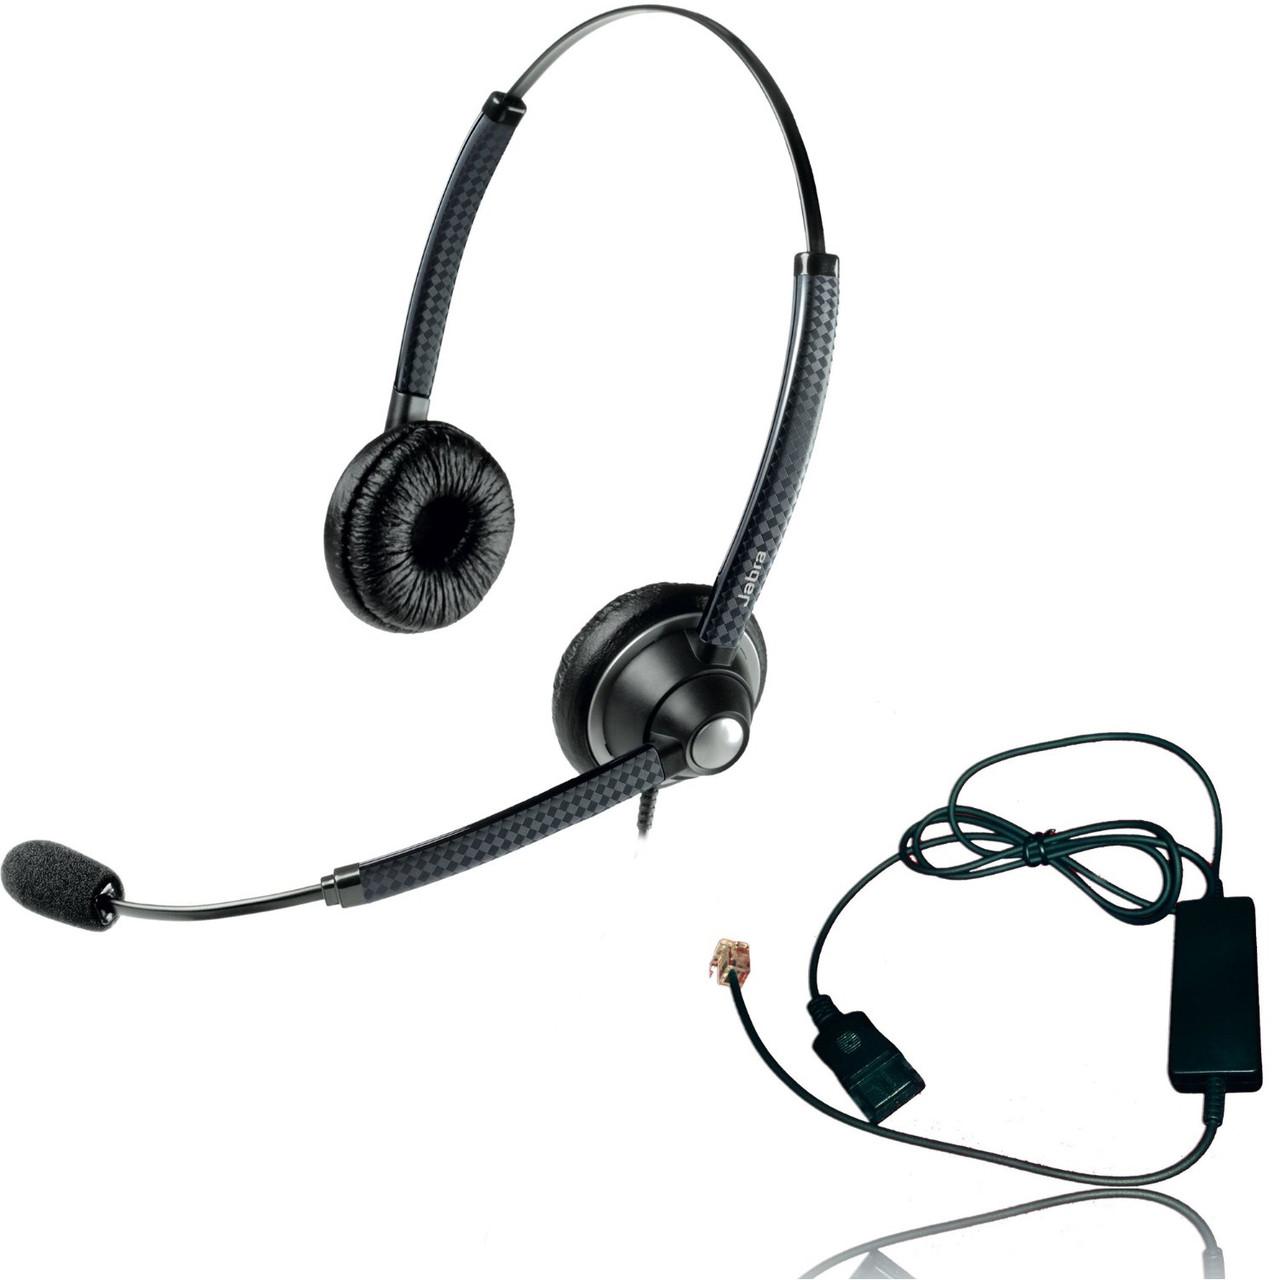 jabra biz 1925 dual corded headset with jabra gn1200 smart cord rh headsetstore global teck com Headphone Jack to Speaker Wire Mic Headphone Jack Wiring